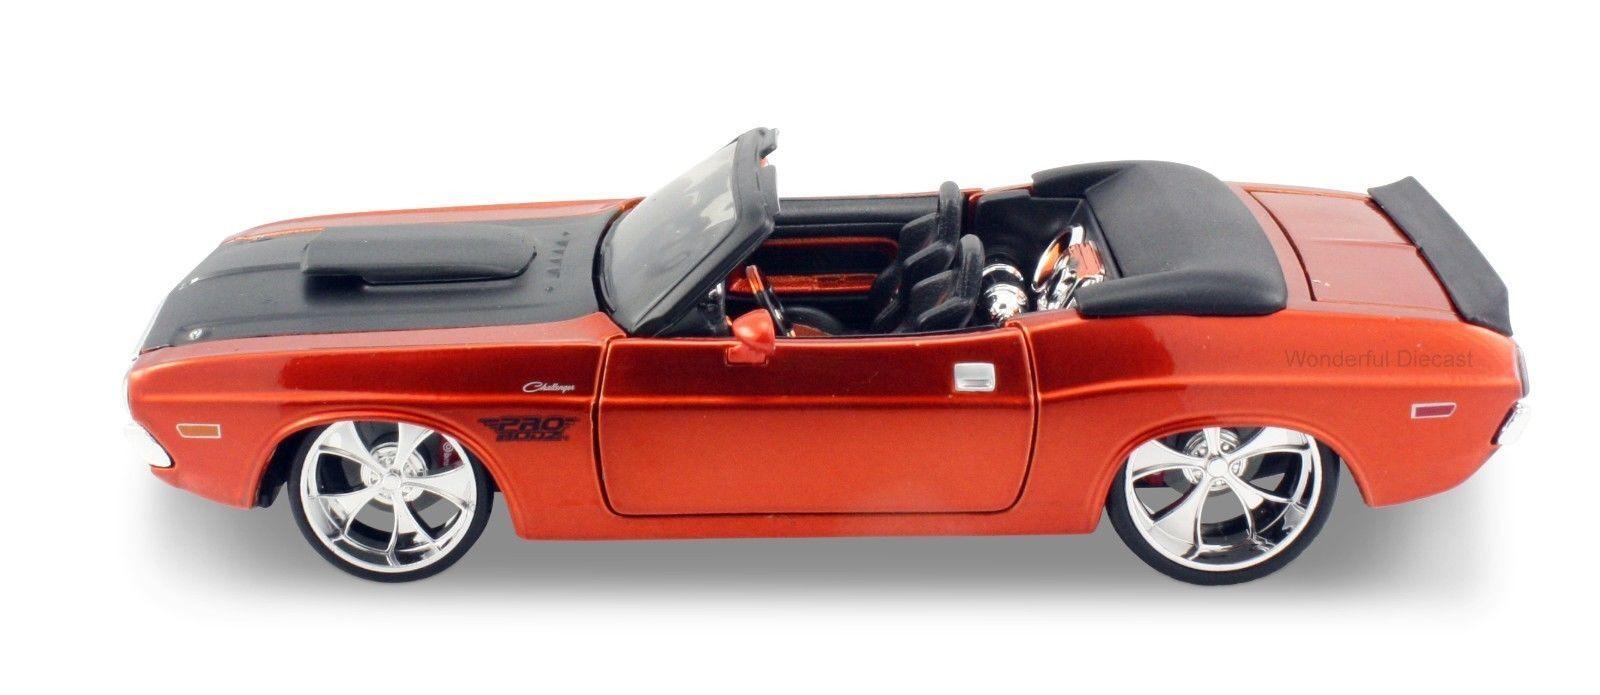 Maisto 1 24 1970 Dodge Dodge Dodge Challenger R T Diecast Model Sports Racing Car Vehicle b966dc